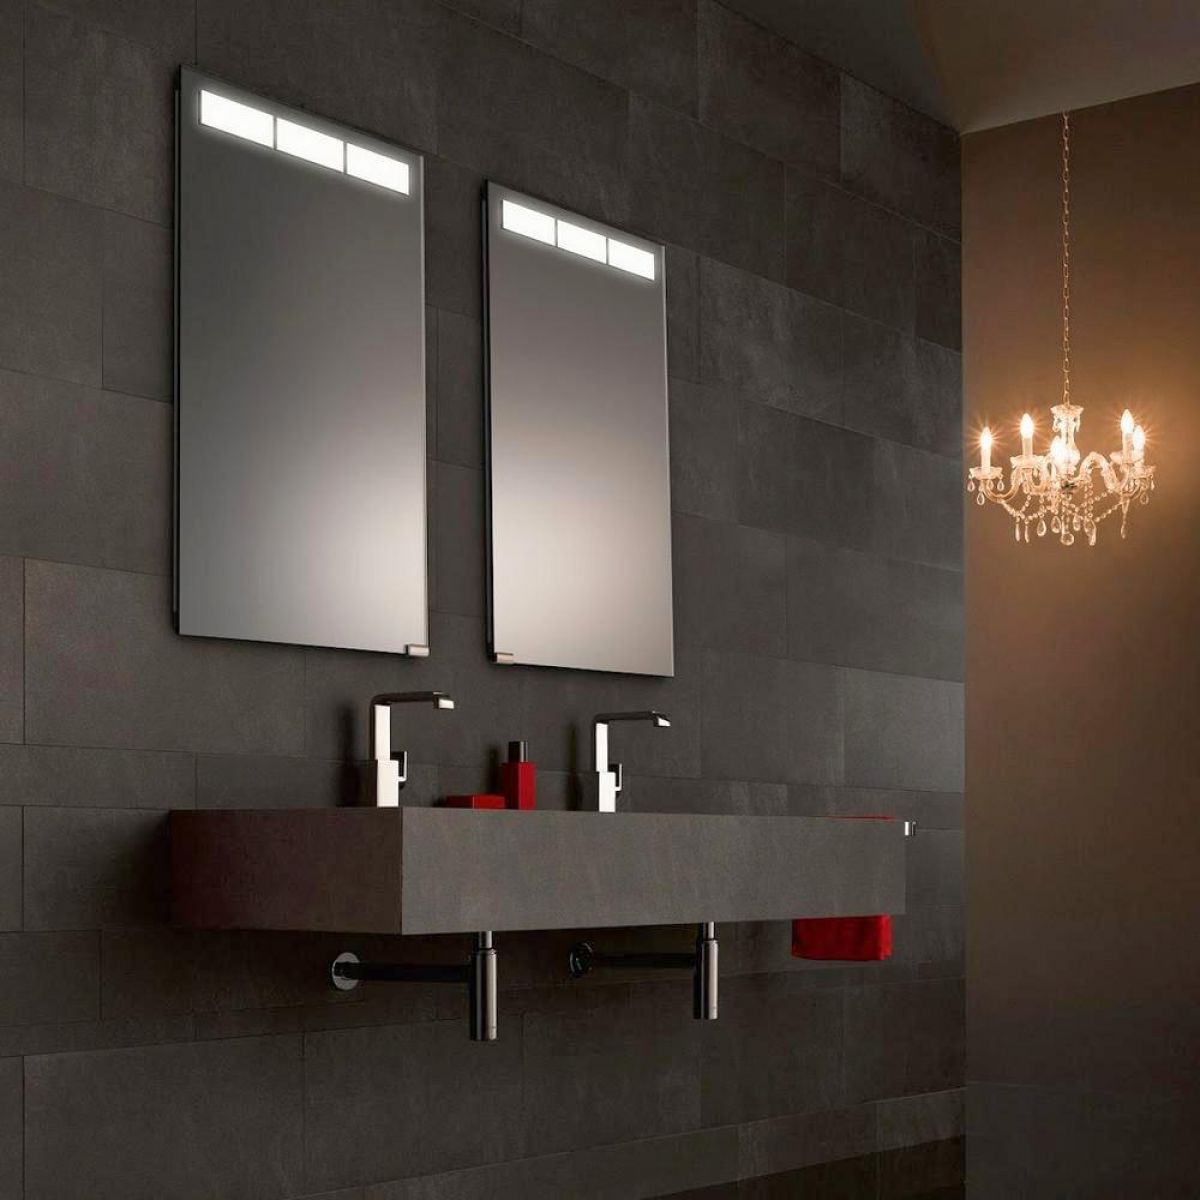 Keuco Royal T1 Inegral Mirror Cabinet Mirror Cabinets Mirror Bathrooms Direct